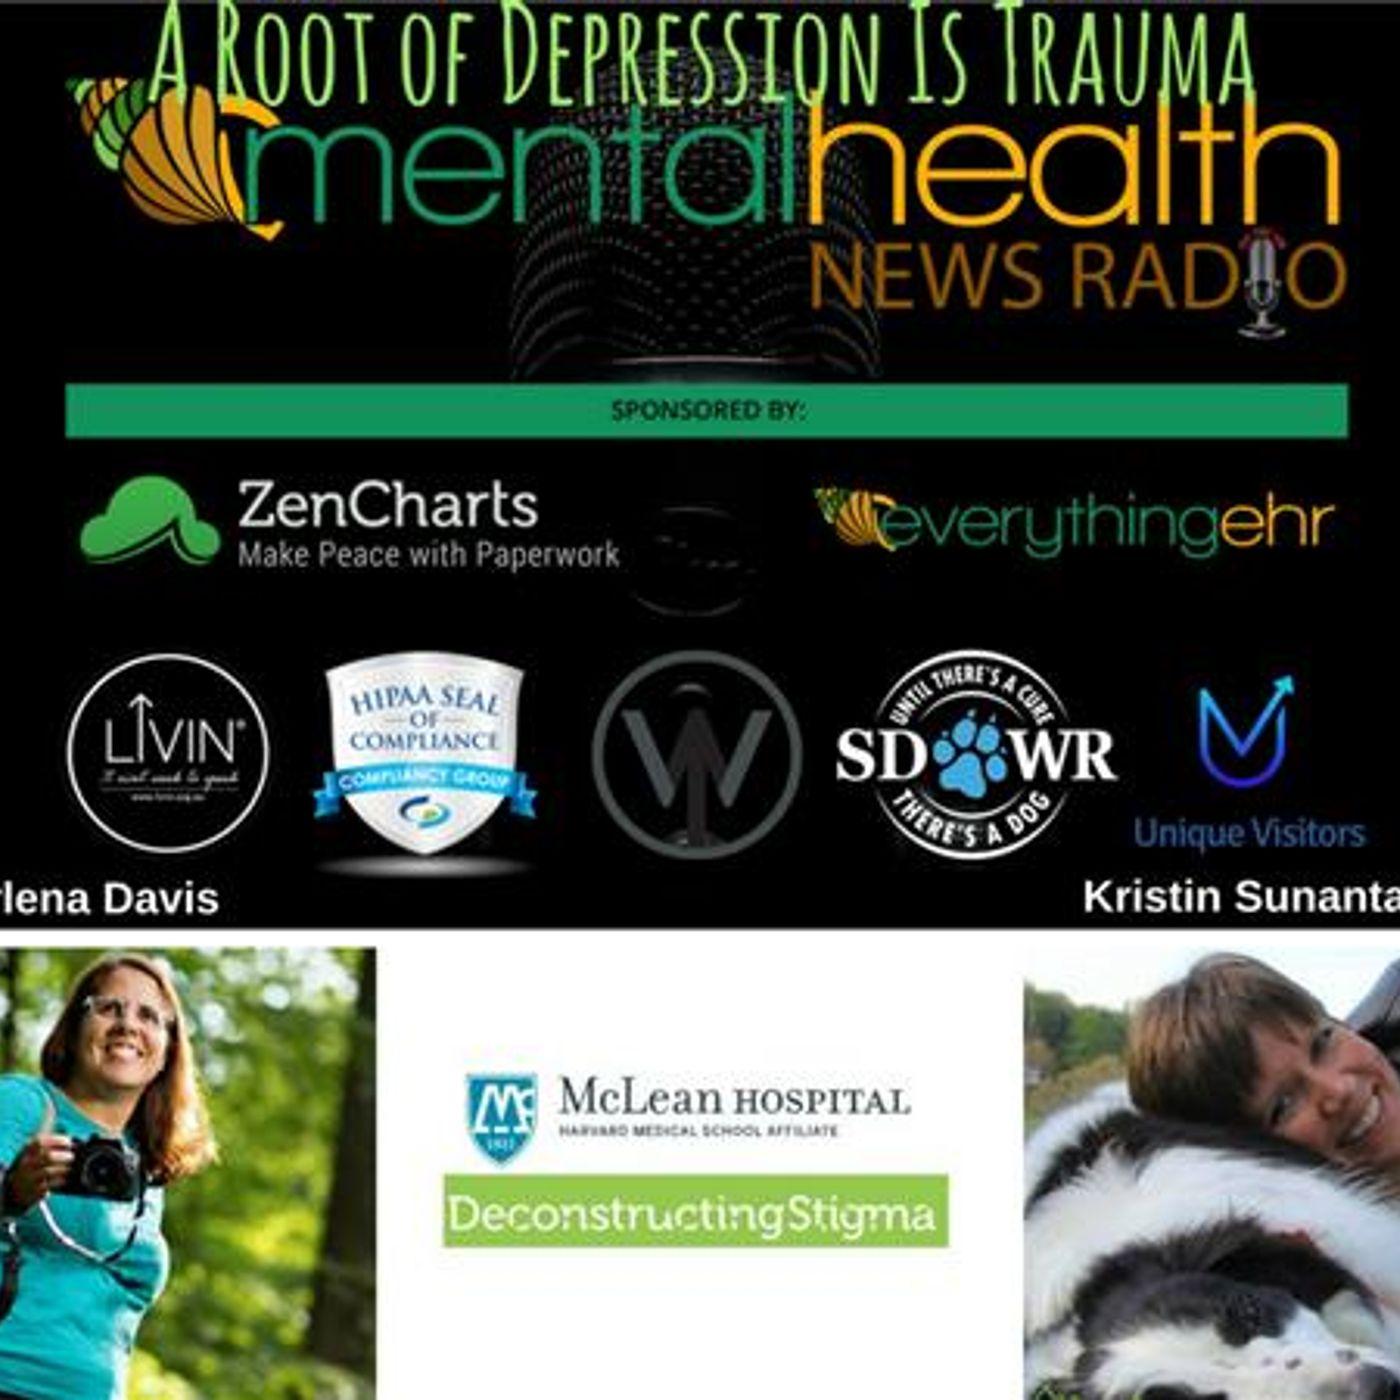 Mental Health News Radio - Deconstructing Stigma: A Root of Depression Is Trauma With Marlena Davis